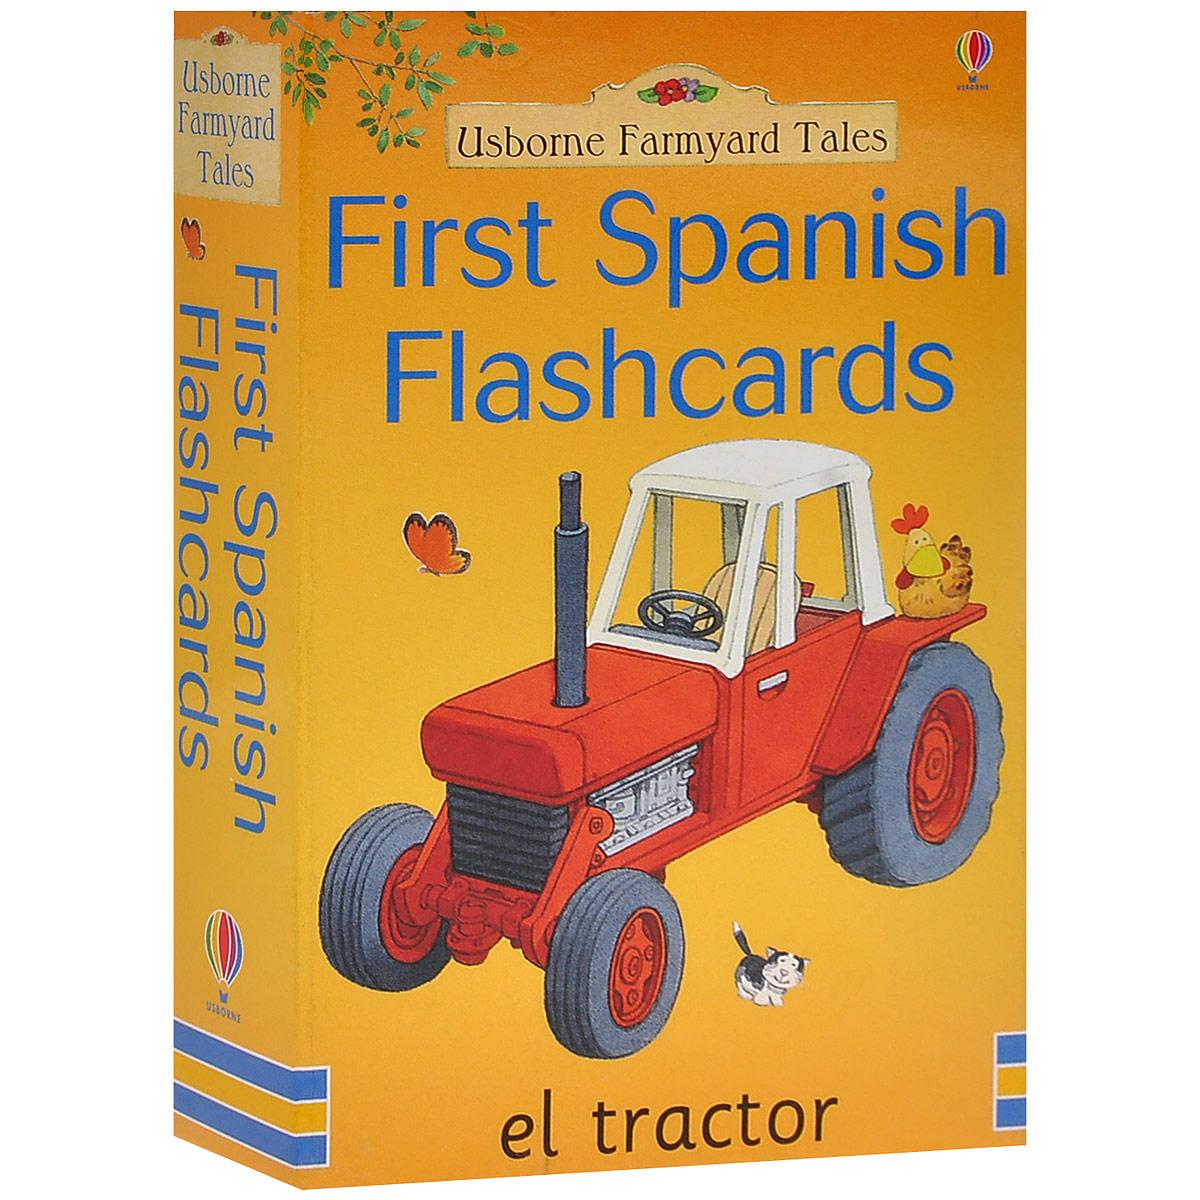 First Spanish Flashcards (набор из 50 карточек) ( 978074605572-4 )